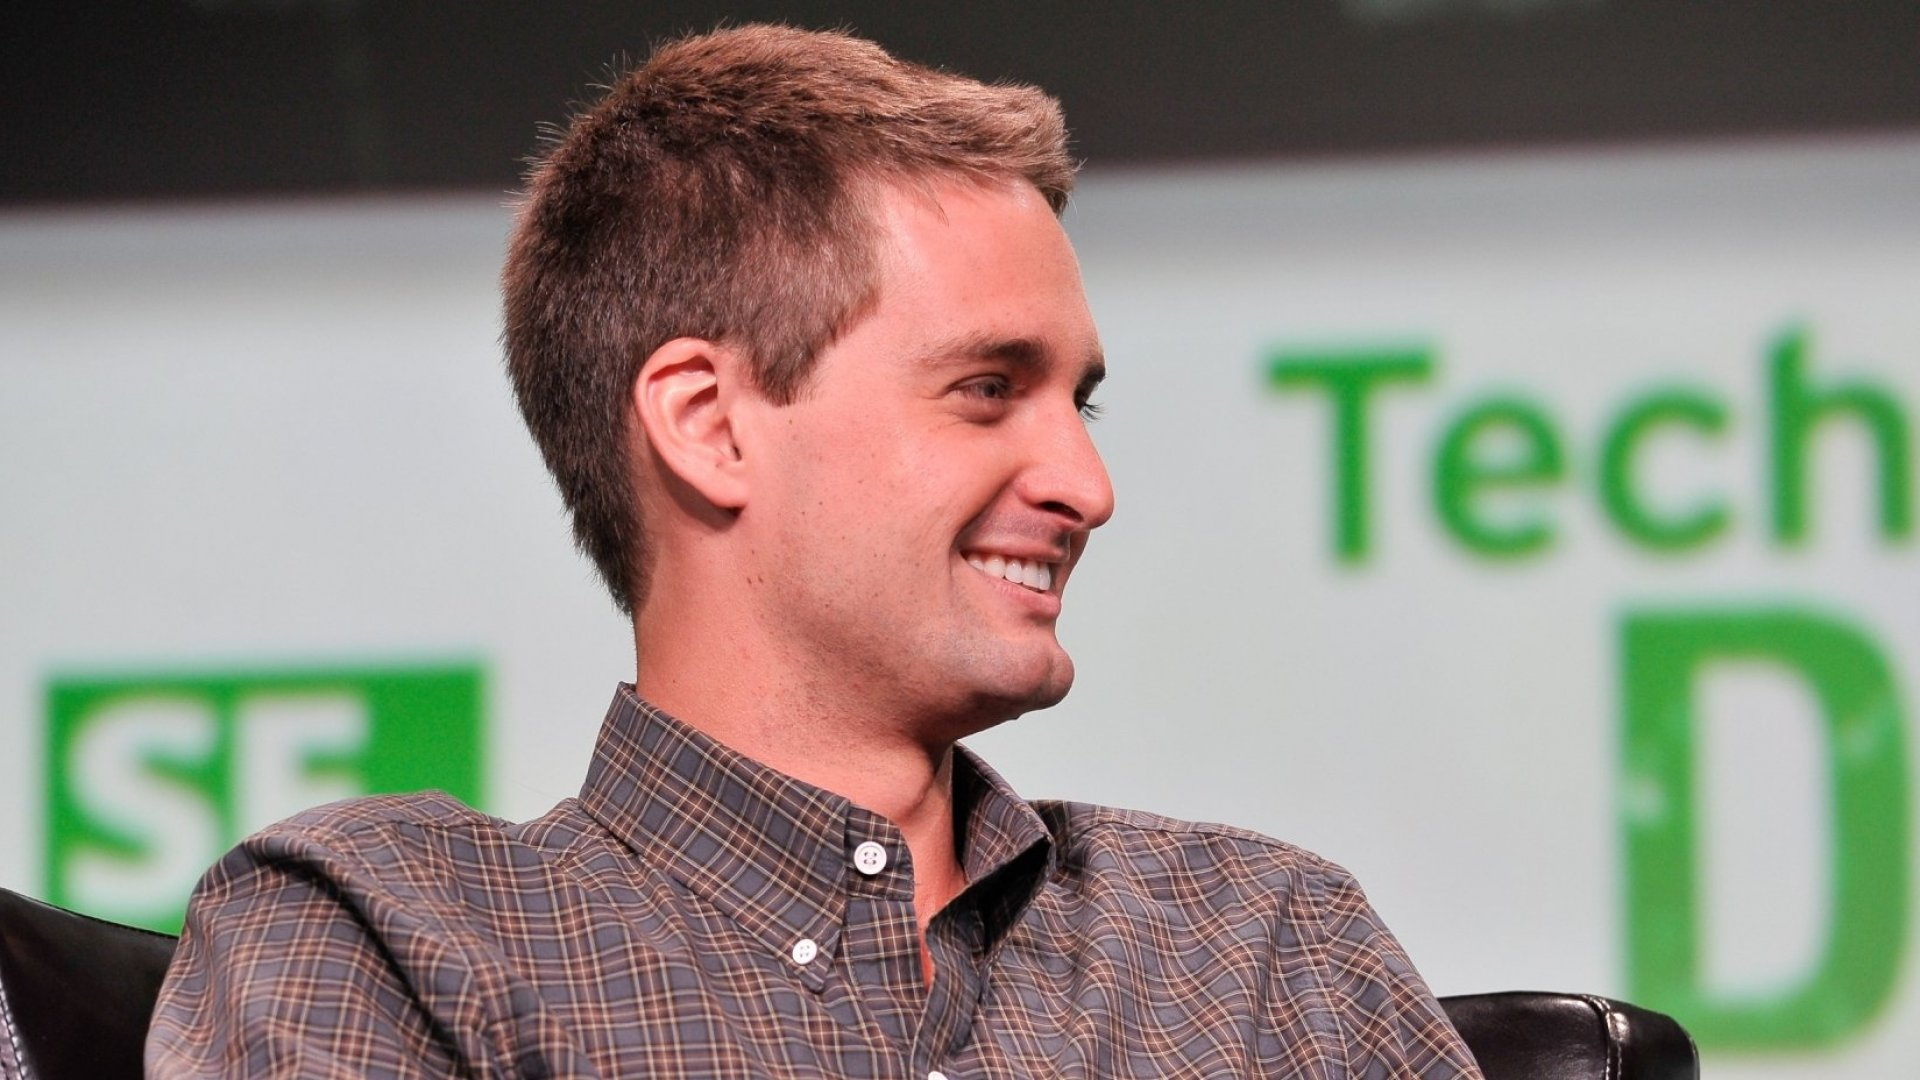 Snapchat Raises a $175 Million Funding Round